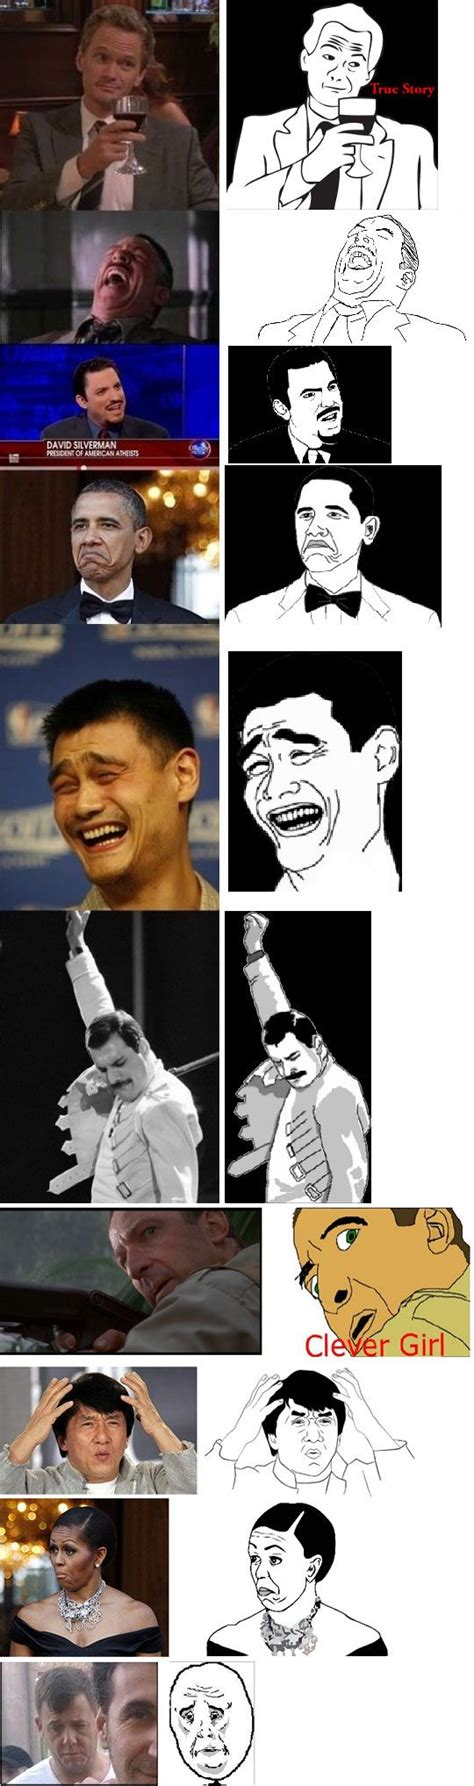 Meme Original Pictures - 25 best ideas about meme faces on pinterest lol memes funny movie memes and snow movie